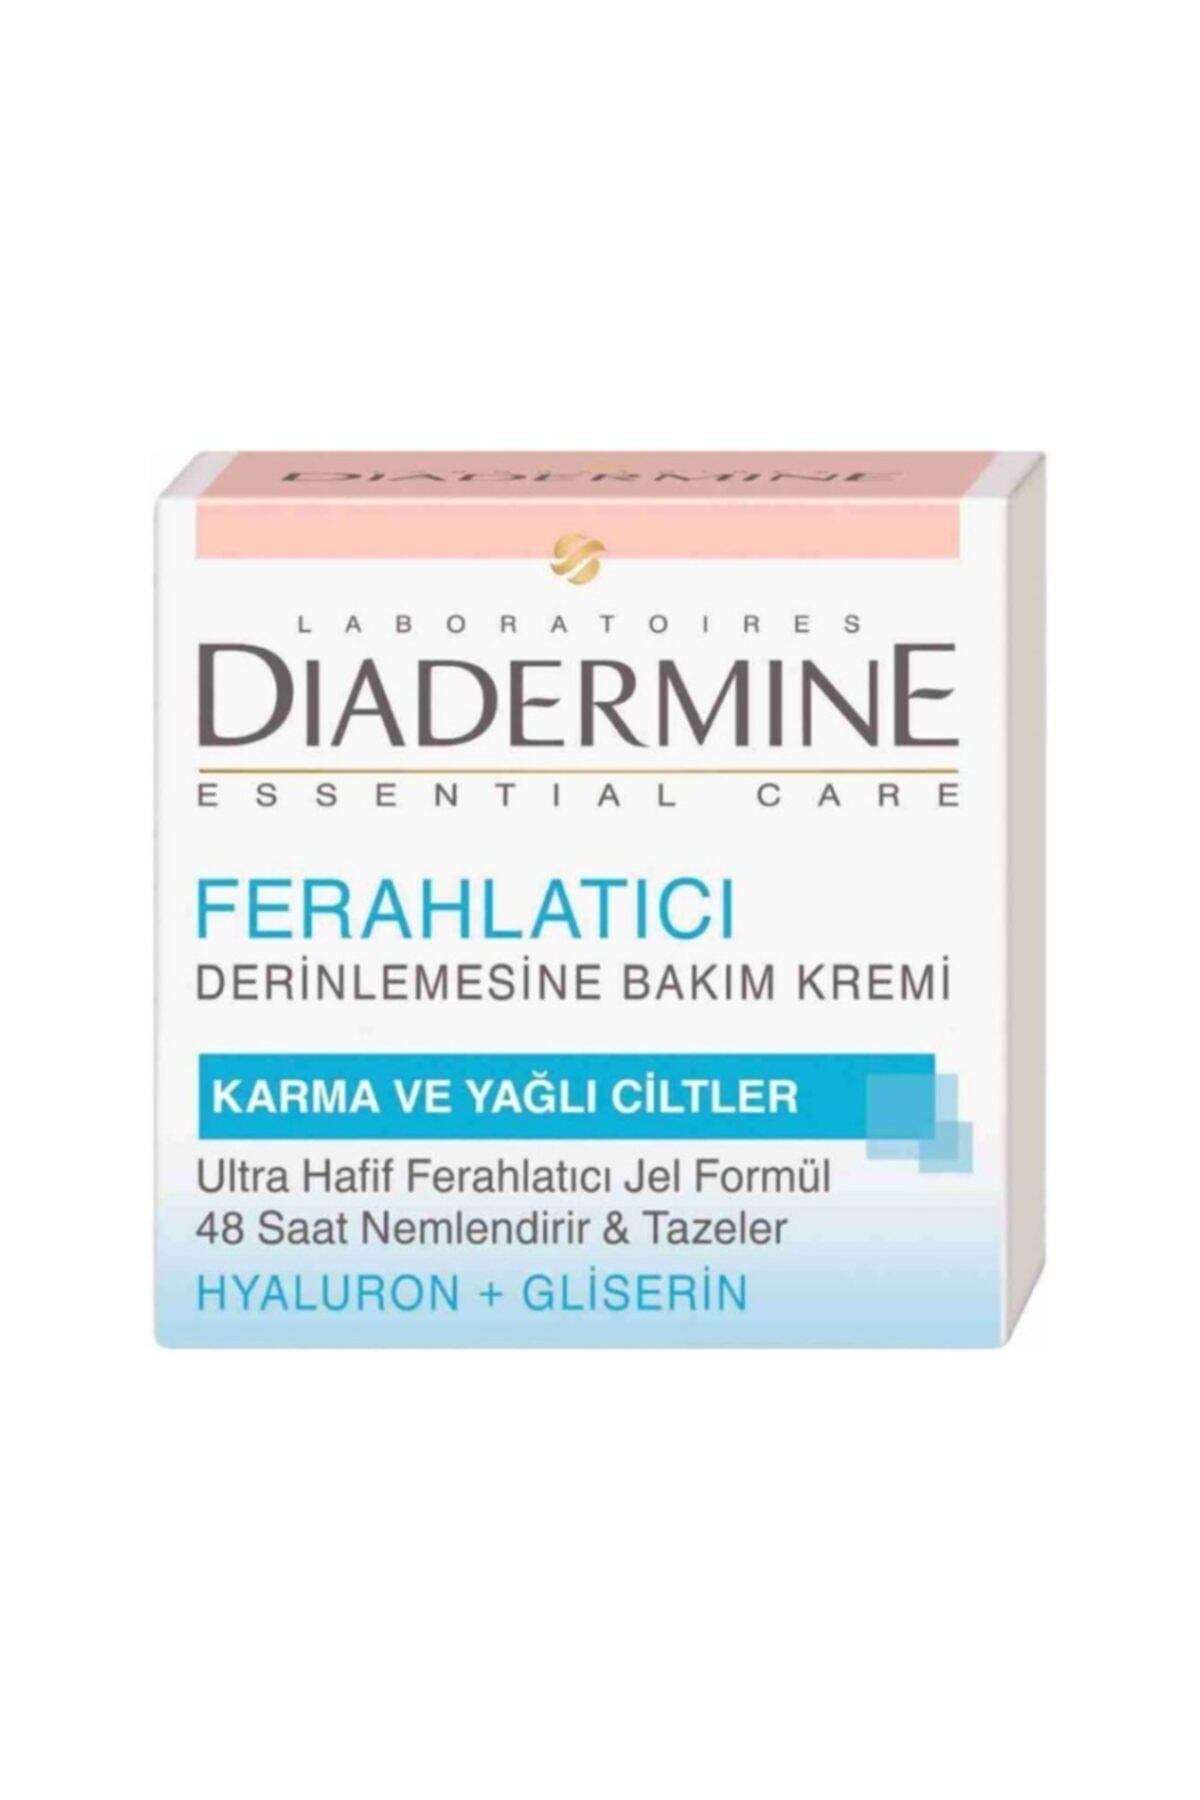 Diadermine Essentials 48 Saat Nemlendirici Jel Krem 50 ml 1